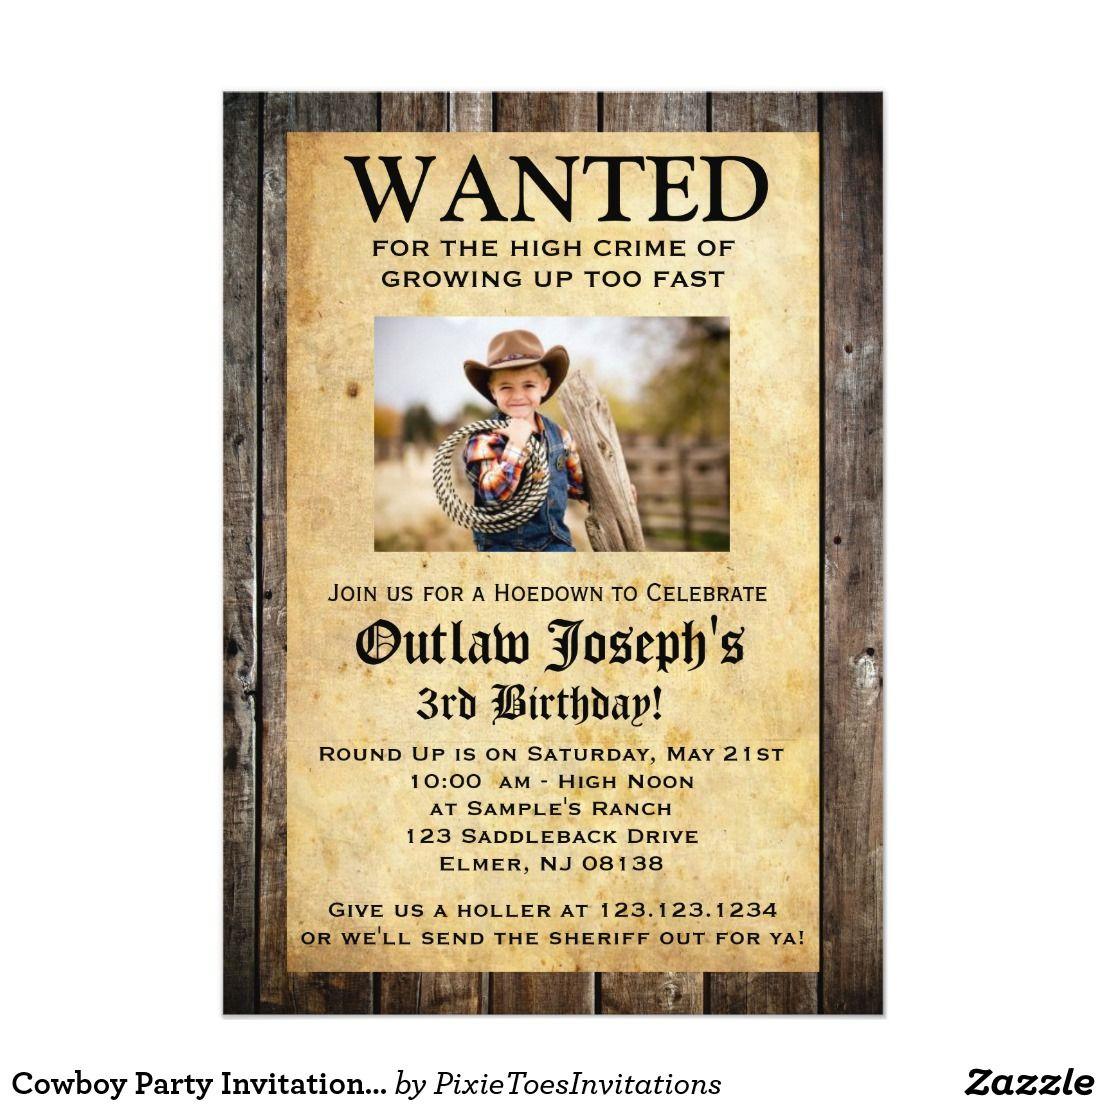 Cowboy Party Invitation | WANTED INVITATION | Cowboy party ...